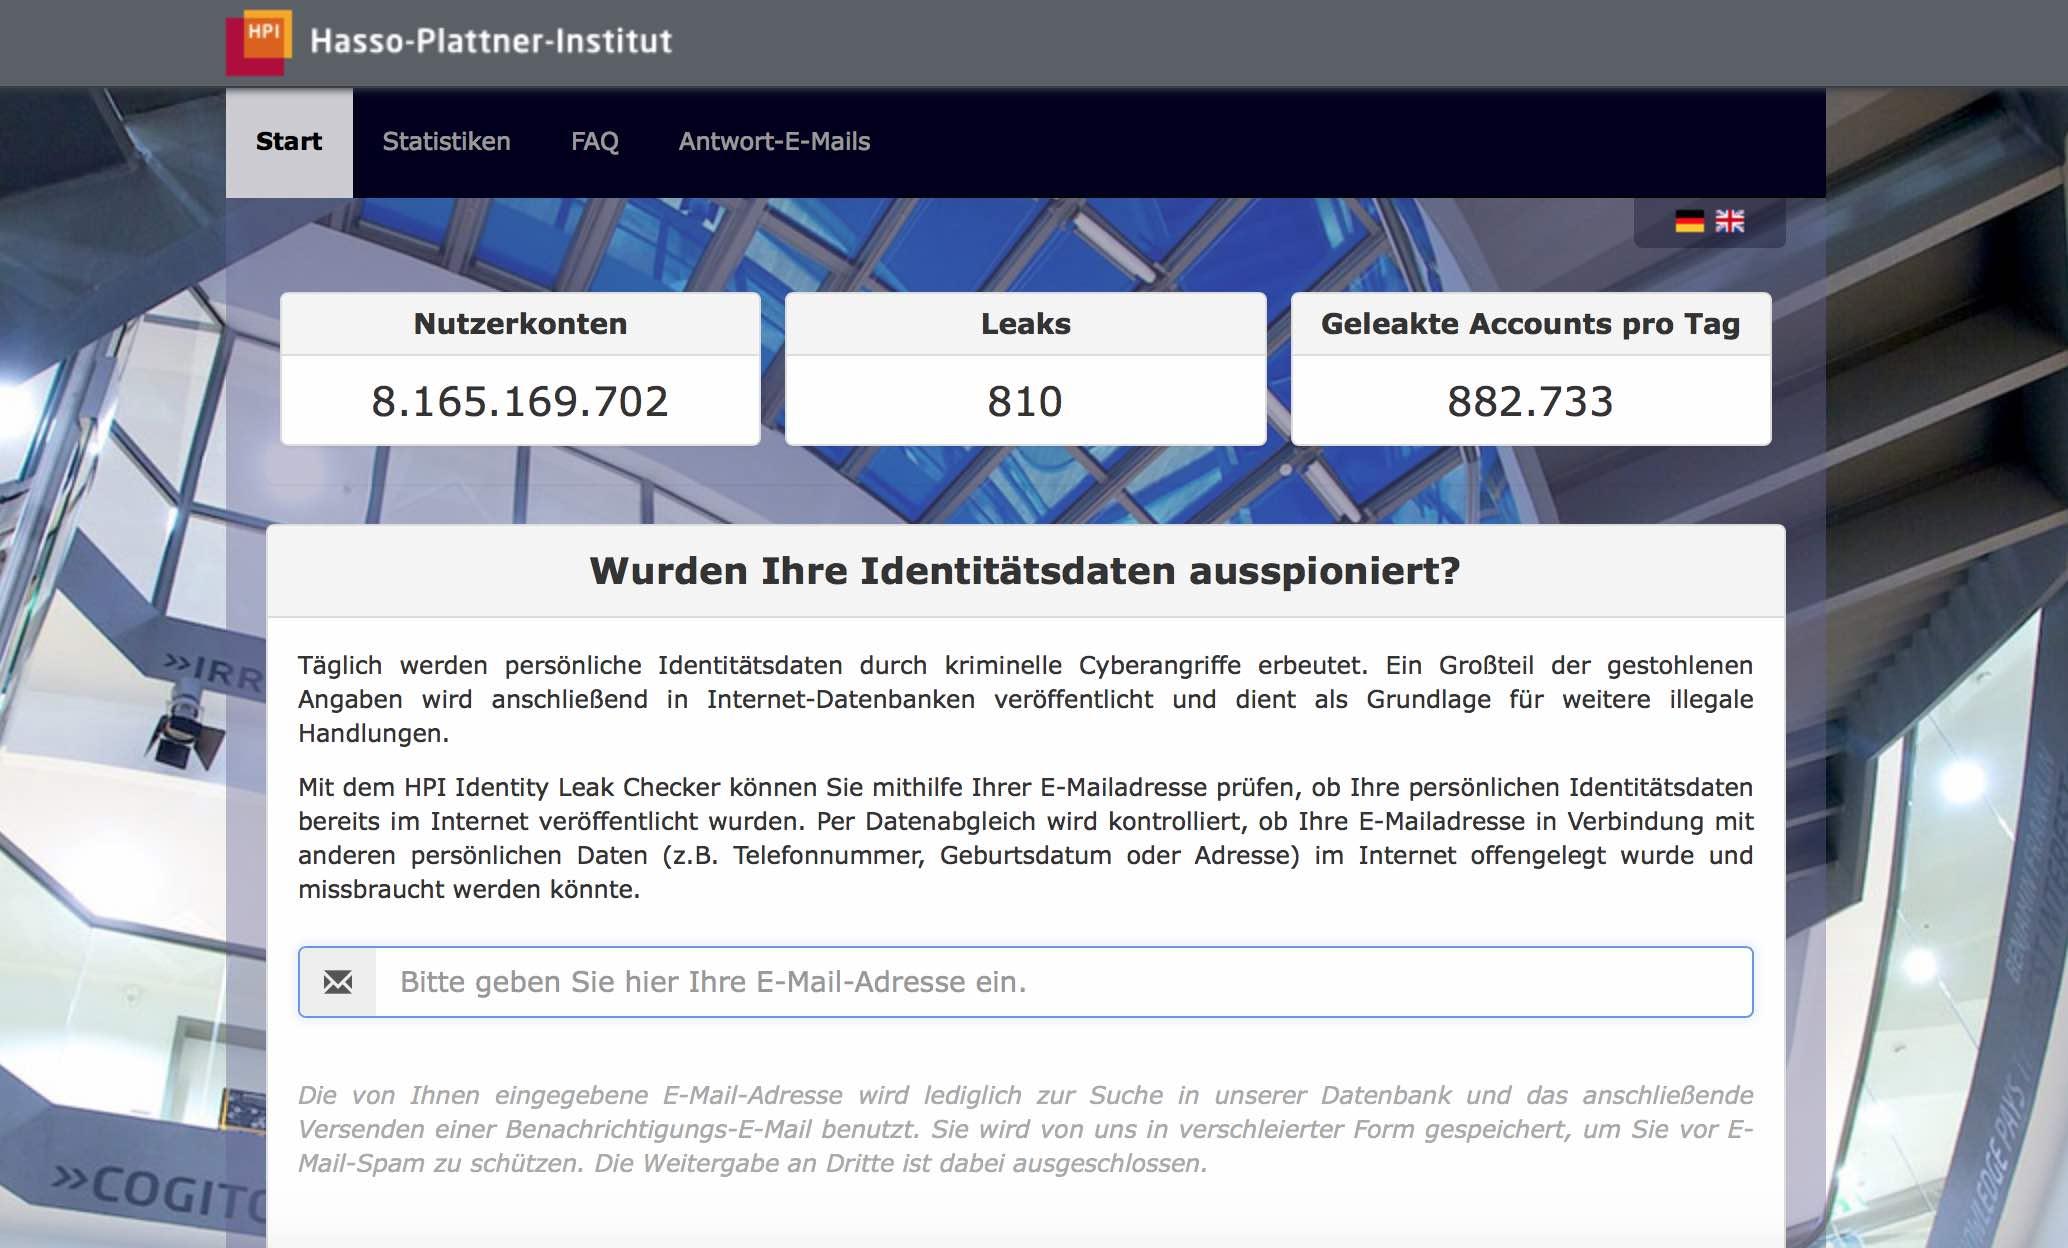 HPI-Identity-Leak-Checker von dem Hasso Plattner Institut